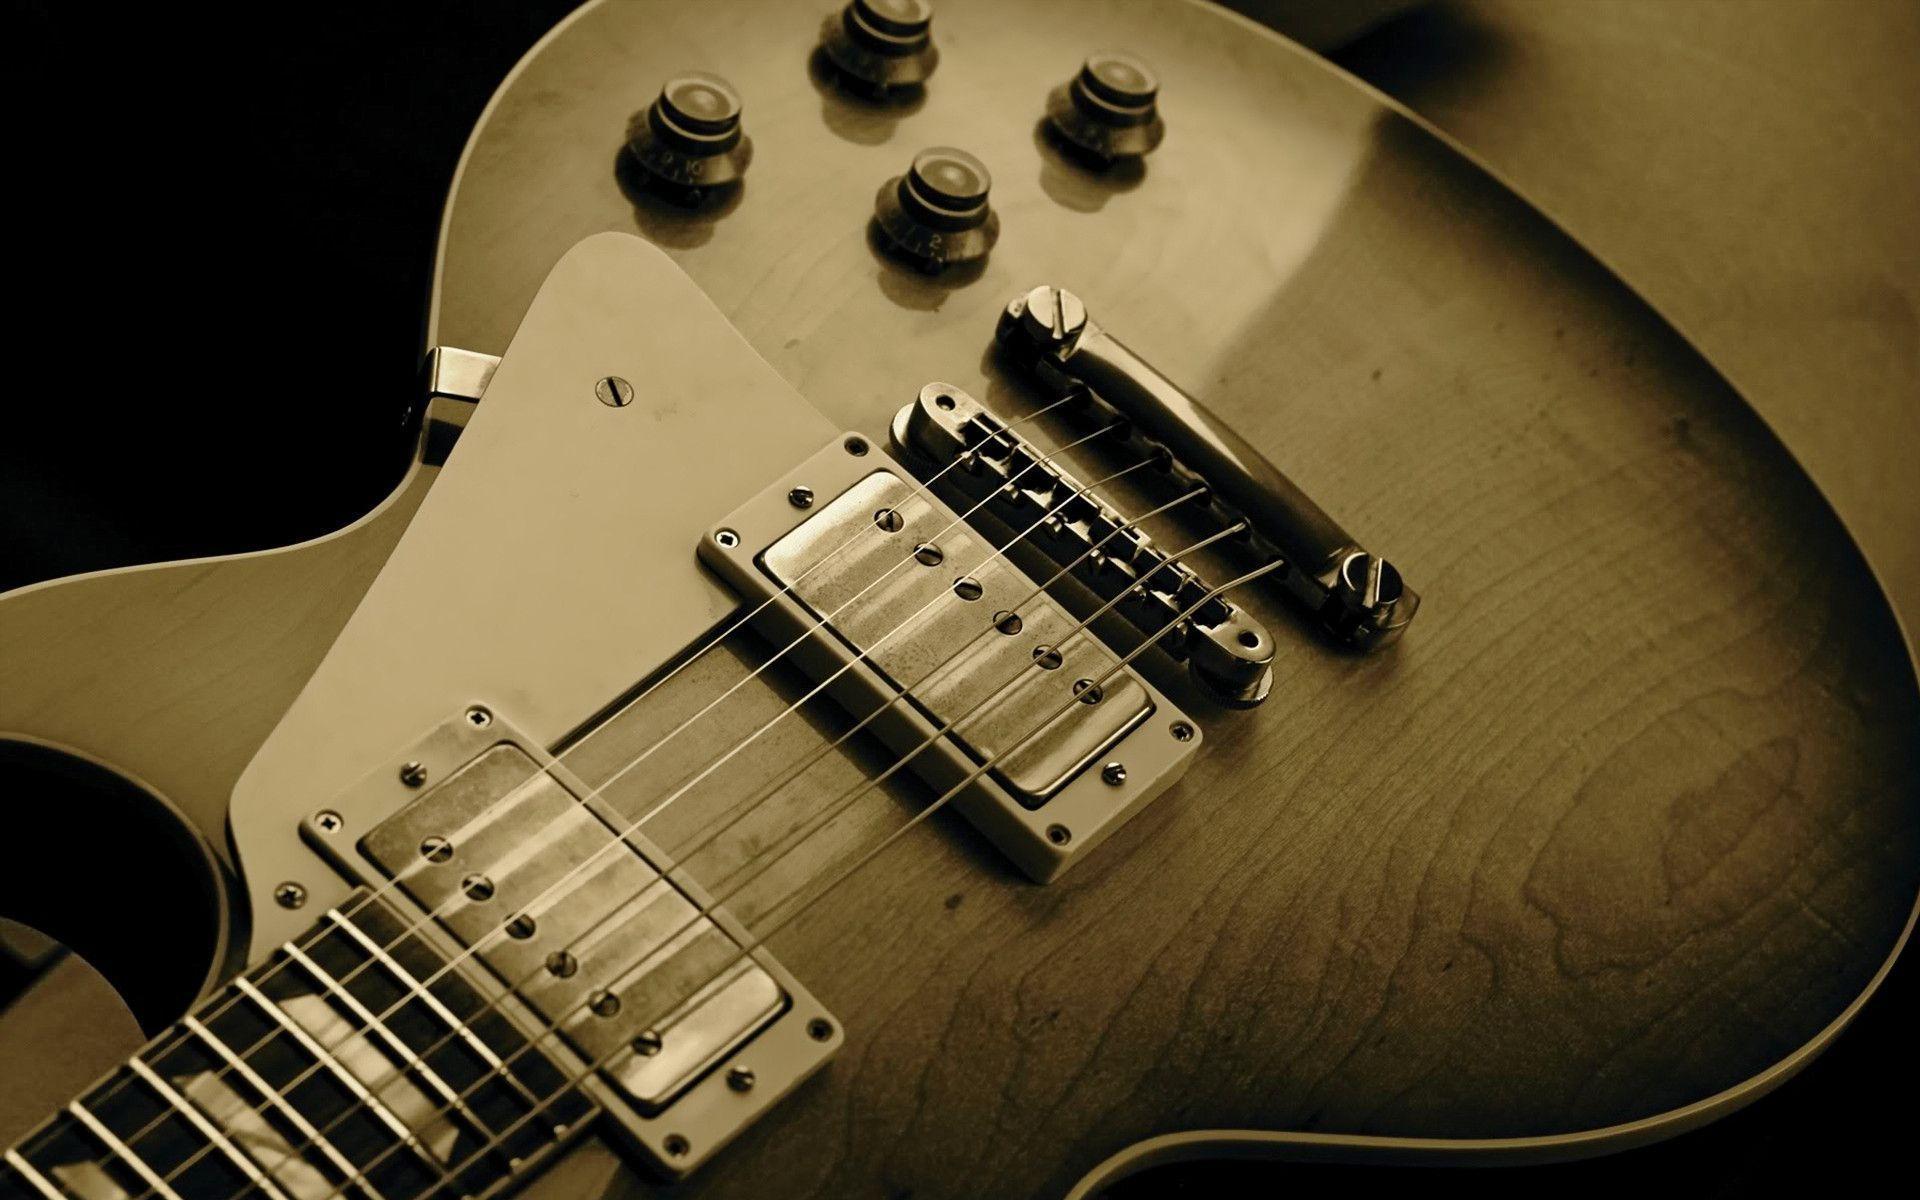 guitar wallpaper by artush - photo #19